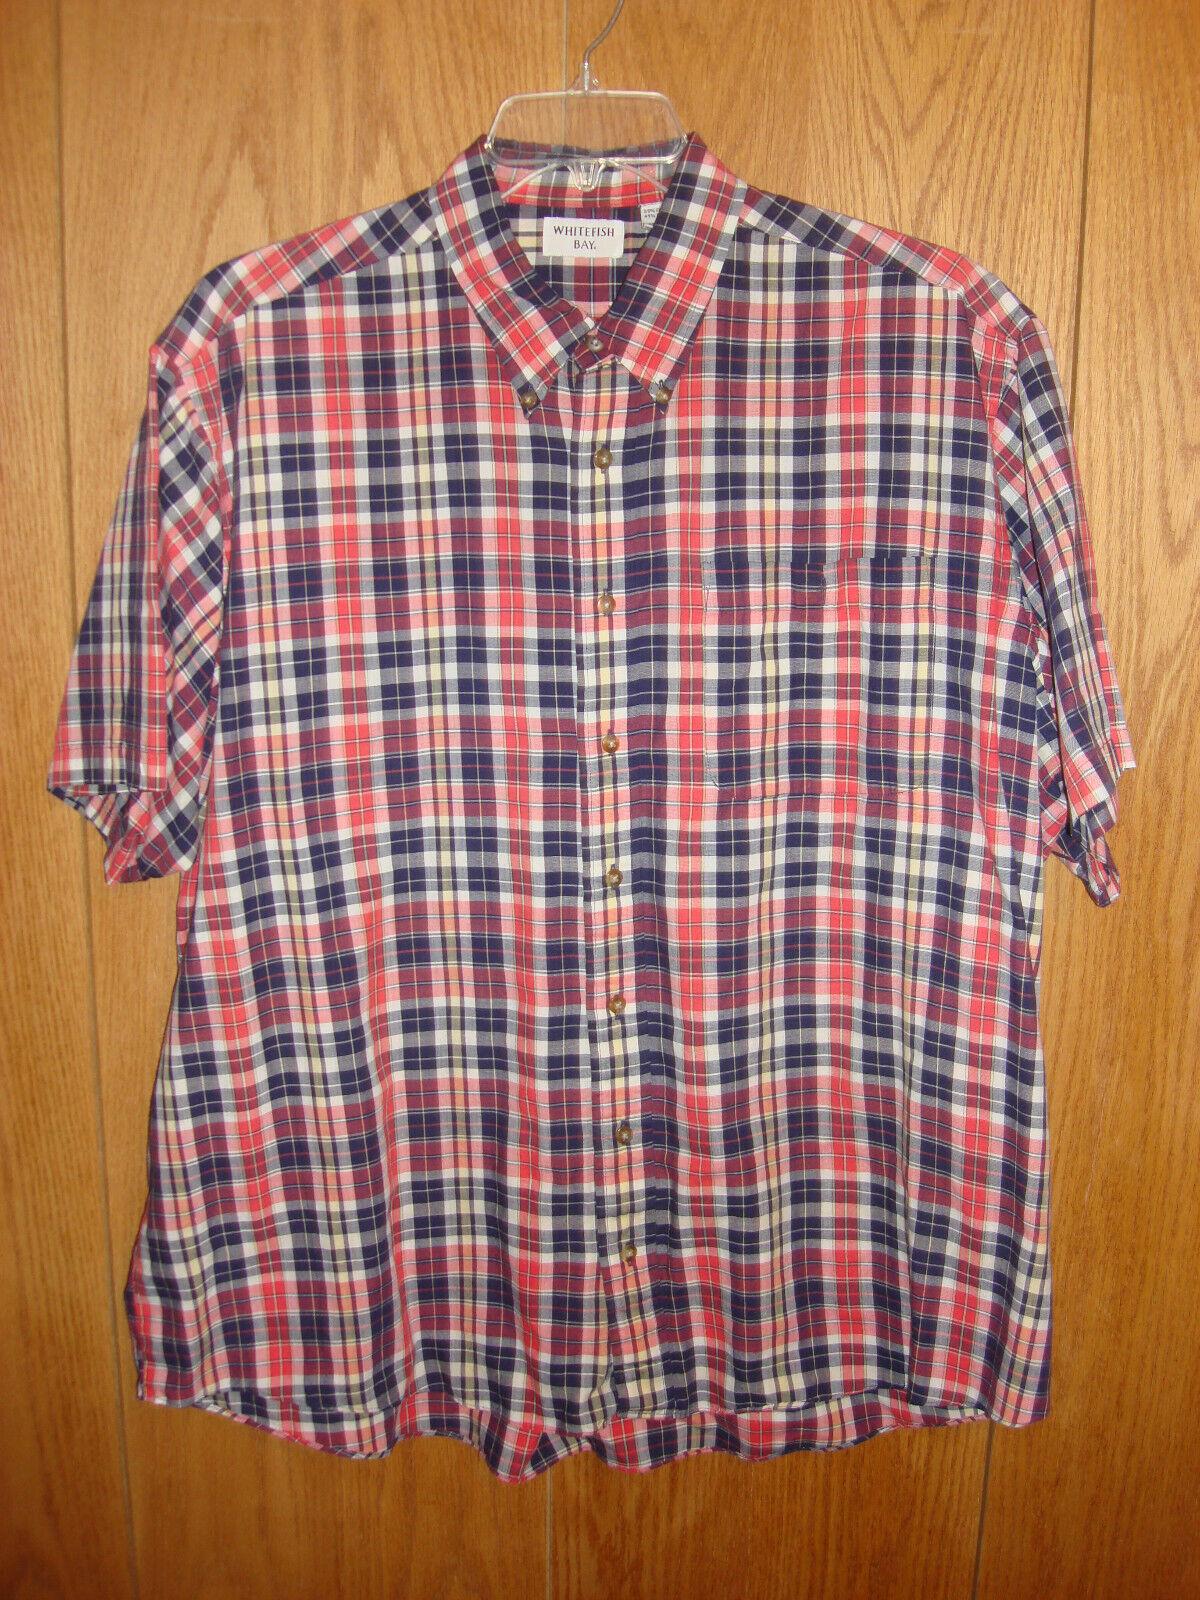 Men/'s Flannel Shirt Button Down Long Sleeve Marino Bay Shirt 100/% Cotton NEW .